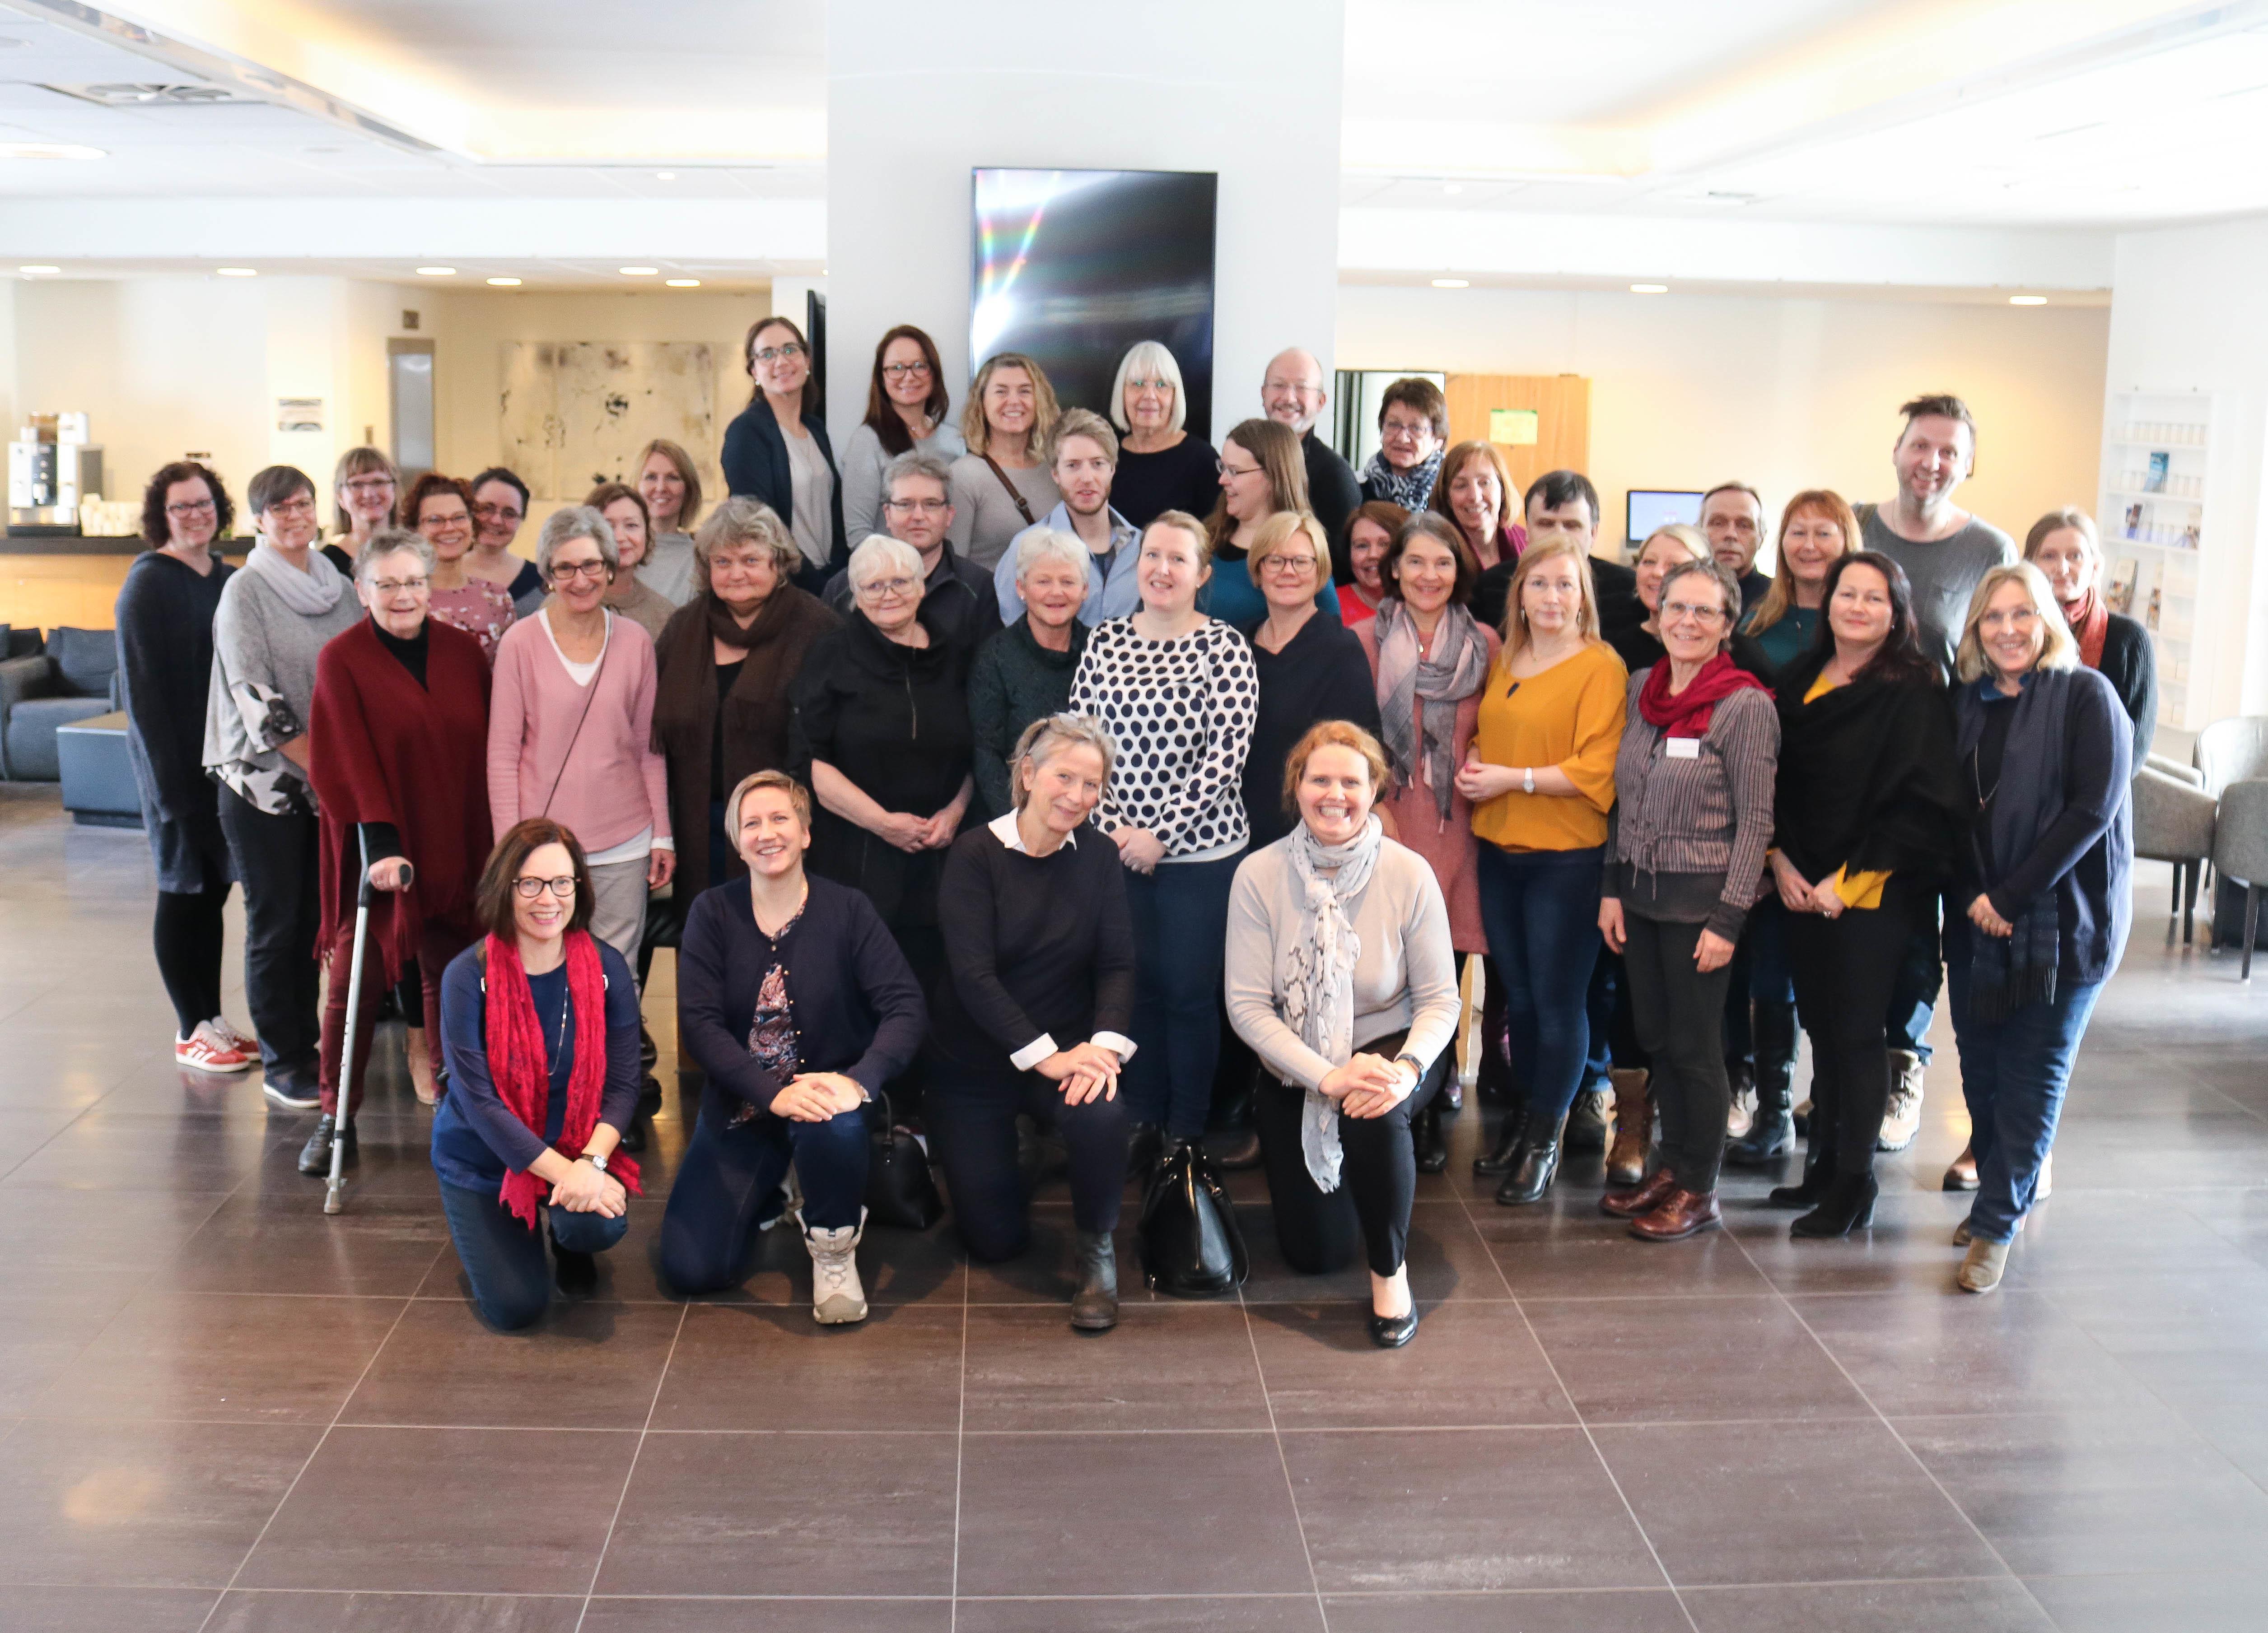 Fellesbilde av cirka femti rådgivere fra NKDB, under rådgiversamling i Asker Scandic.